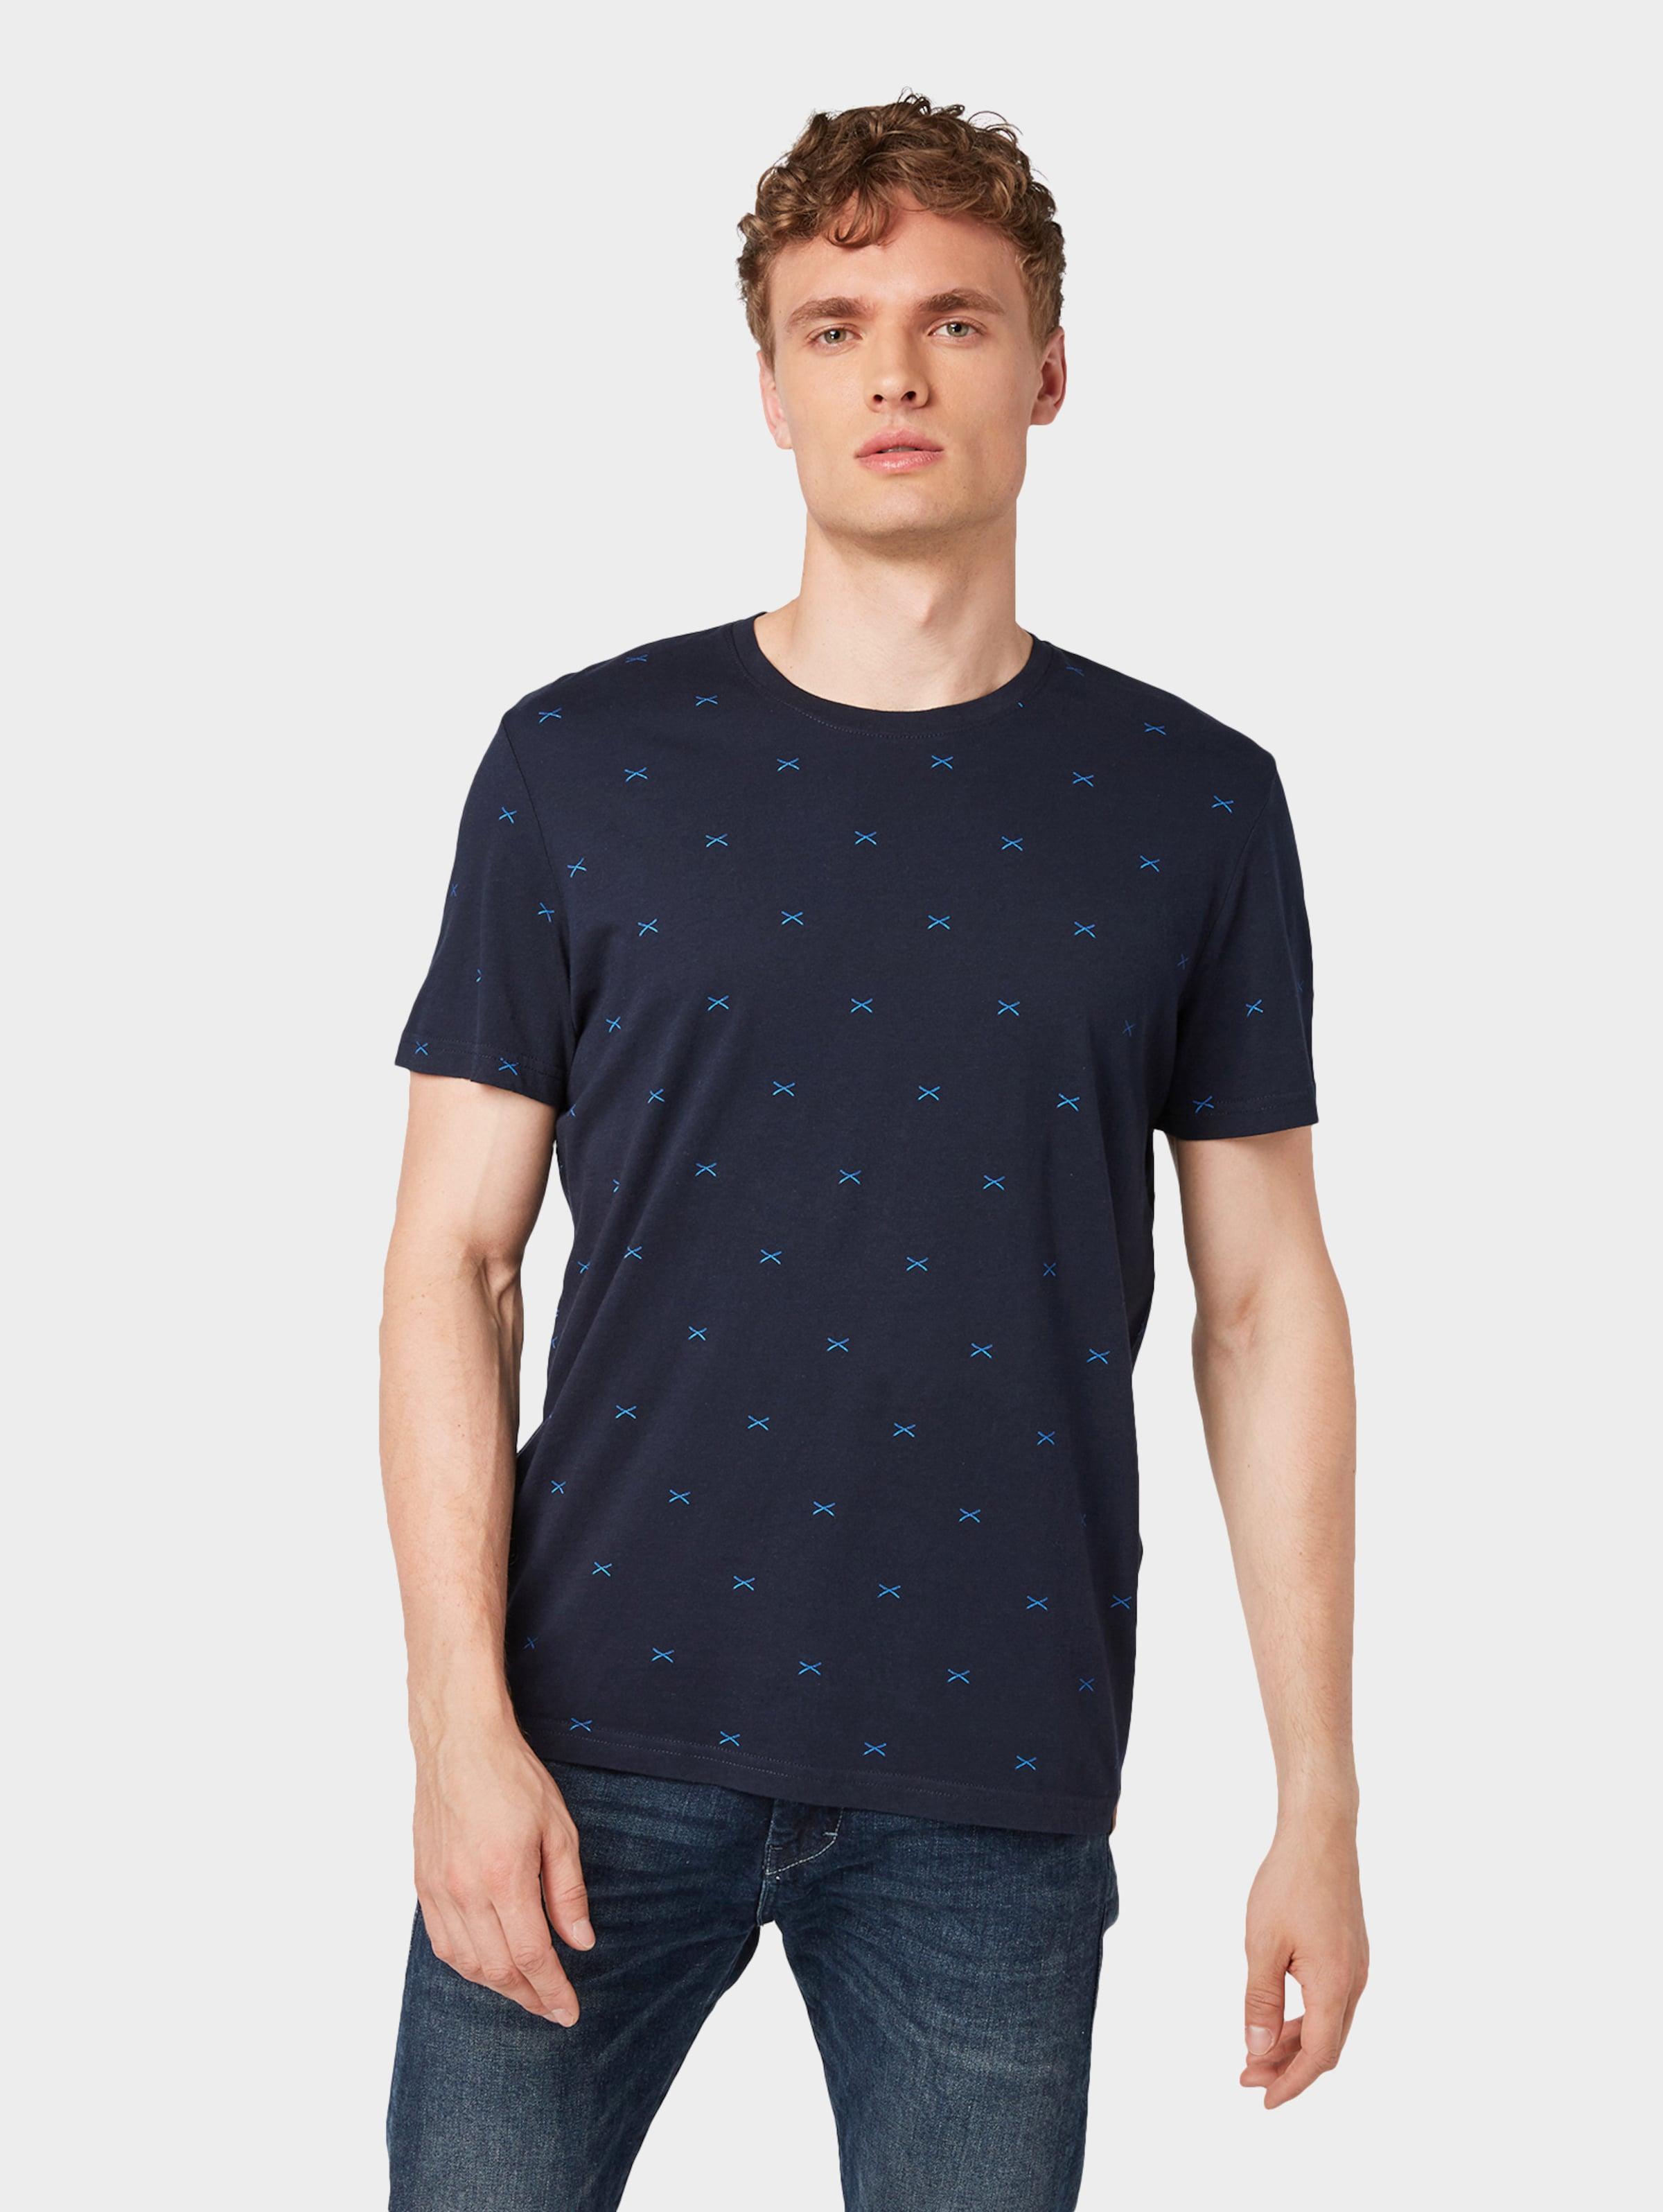 Tailor Tom Tom Nachtblau Shirt In nOmvN80wy